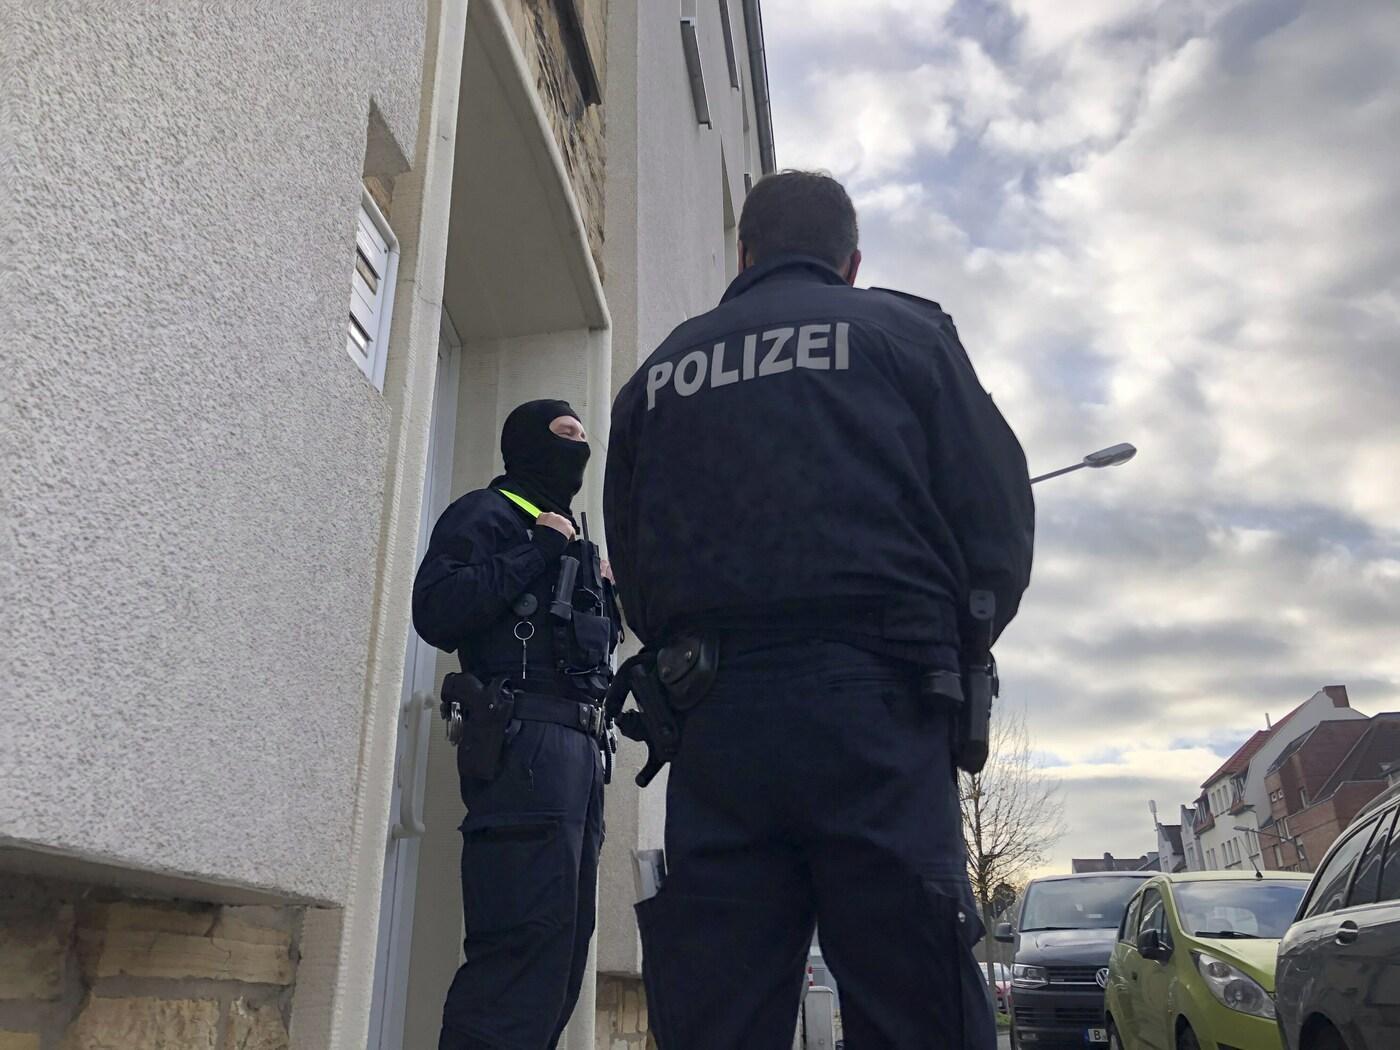 Germania, auto investe pedoni a Treviri: feriti. La polizia indaga - LaPresse